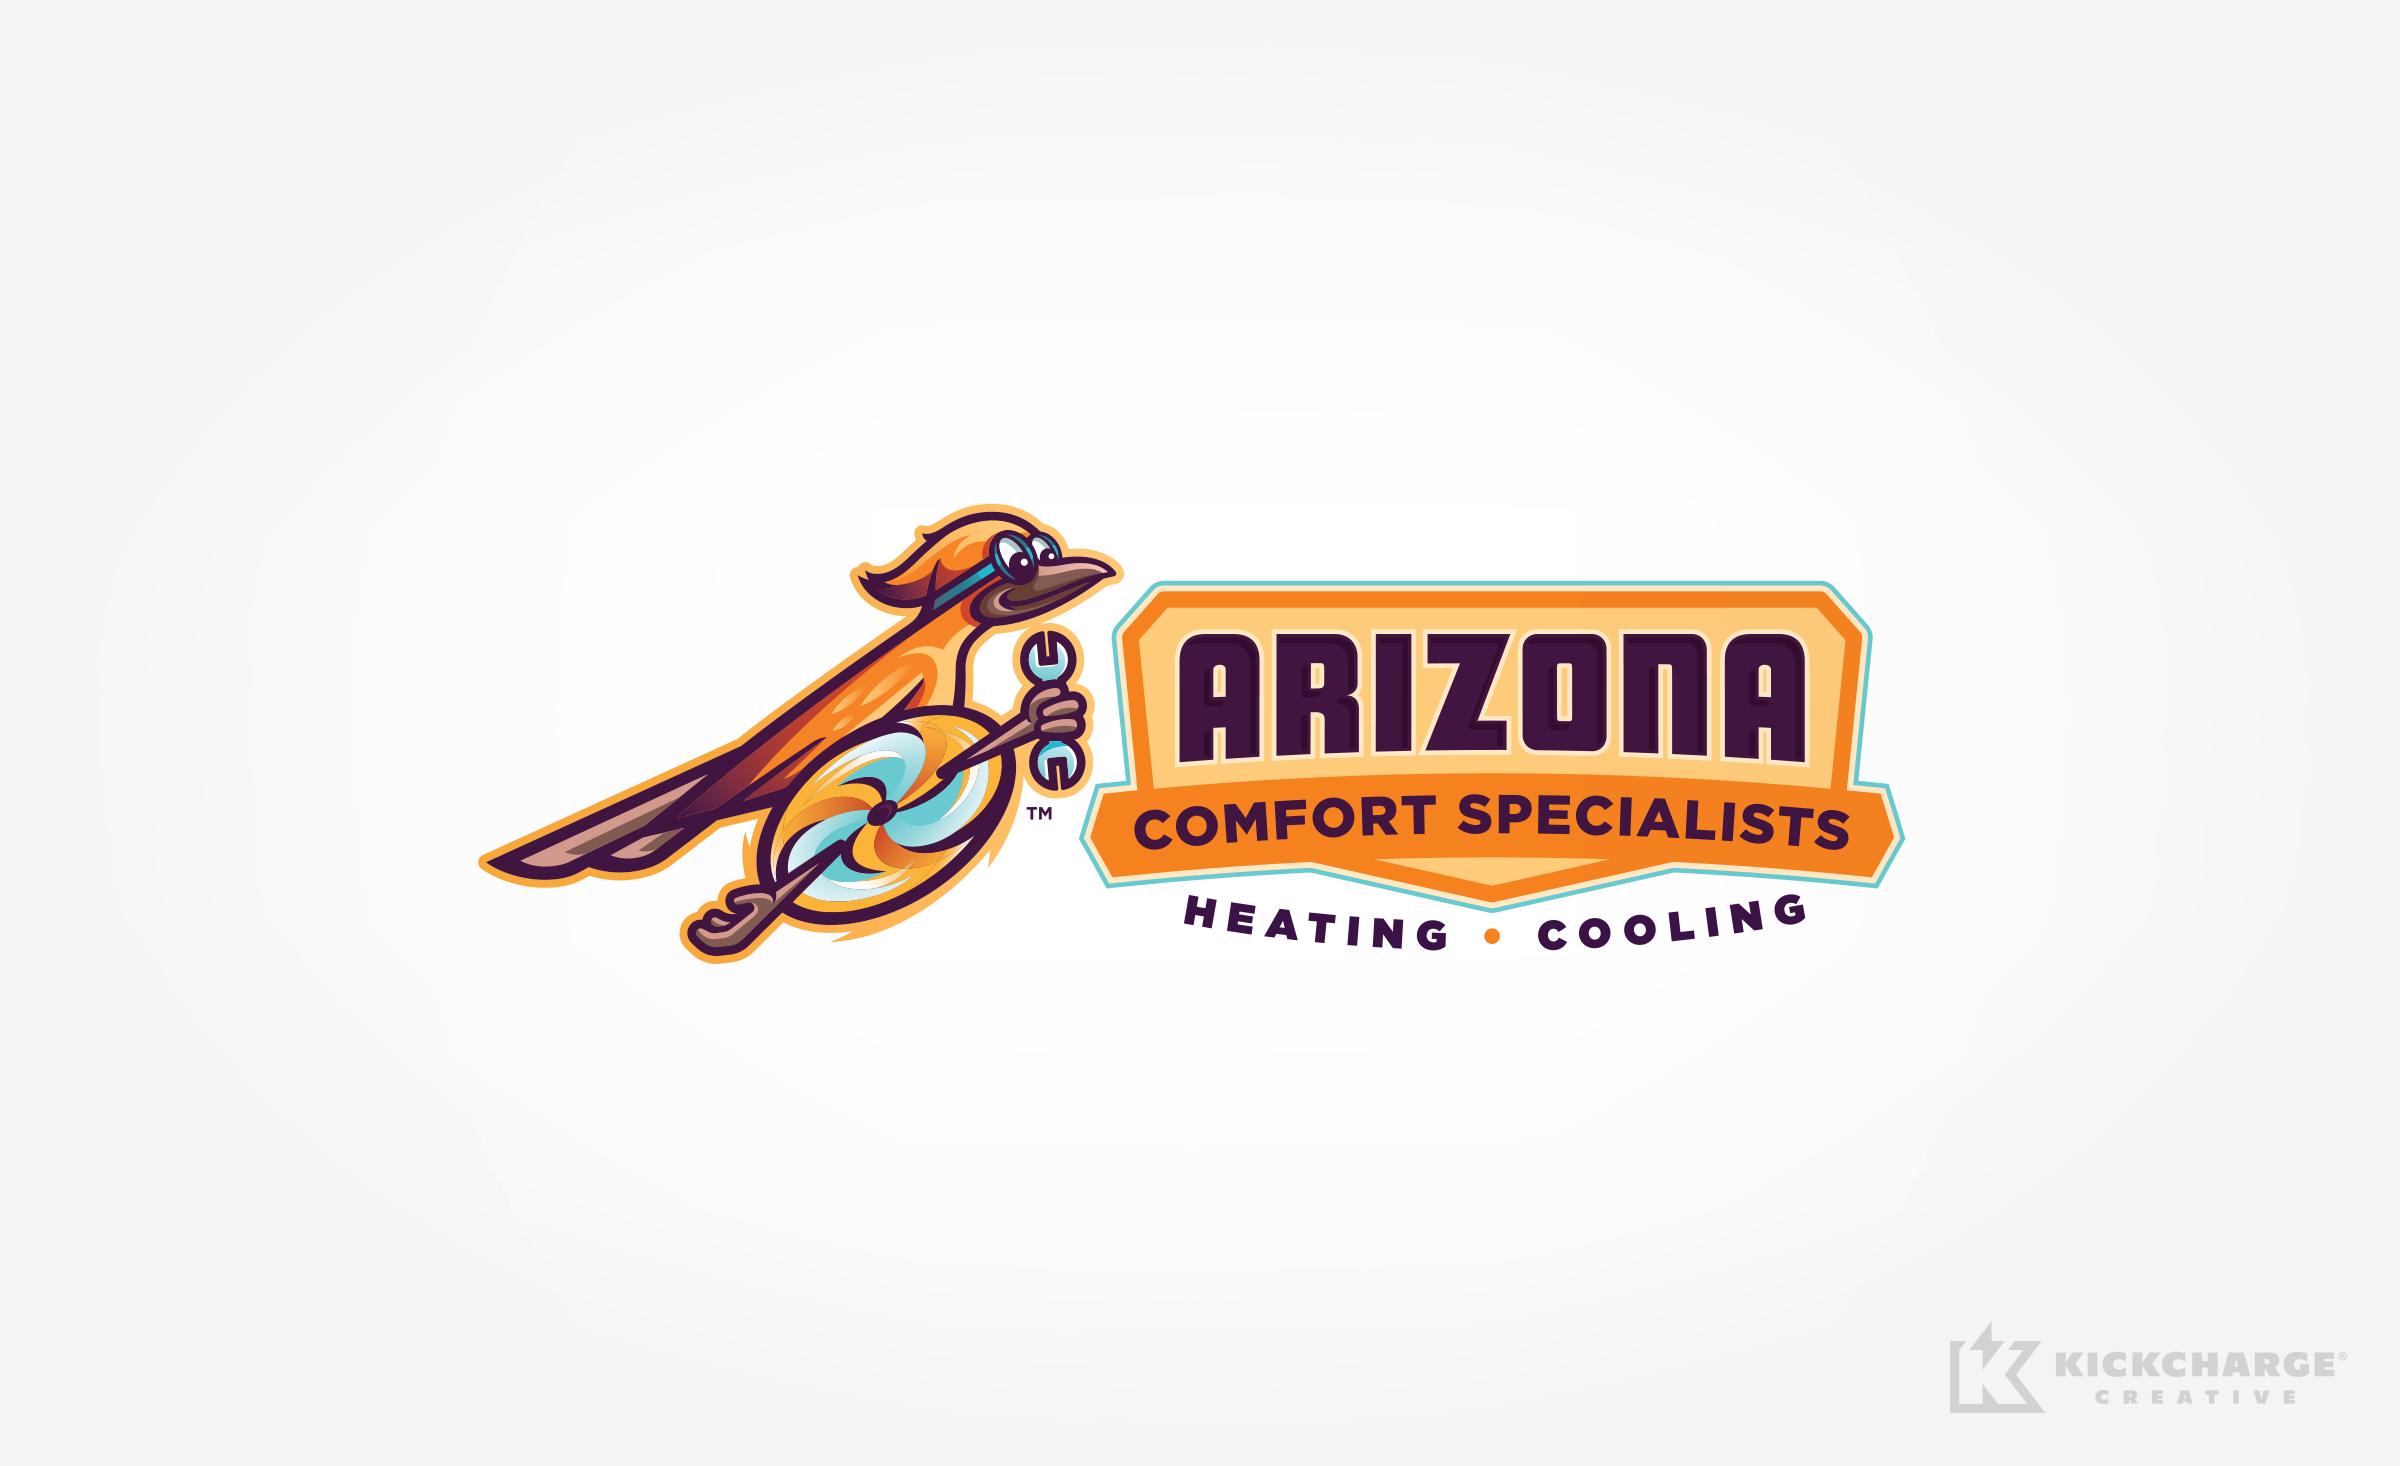 hvac logo for Arizona Comfort Specialists